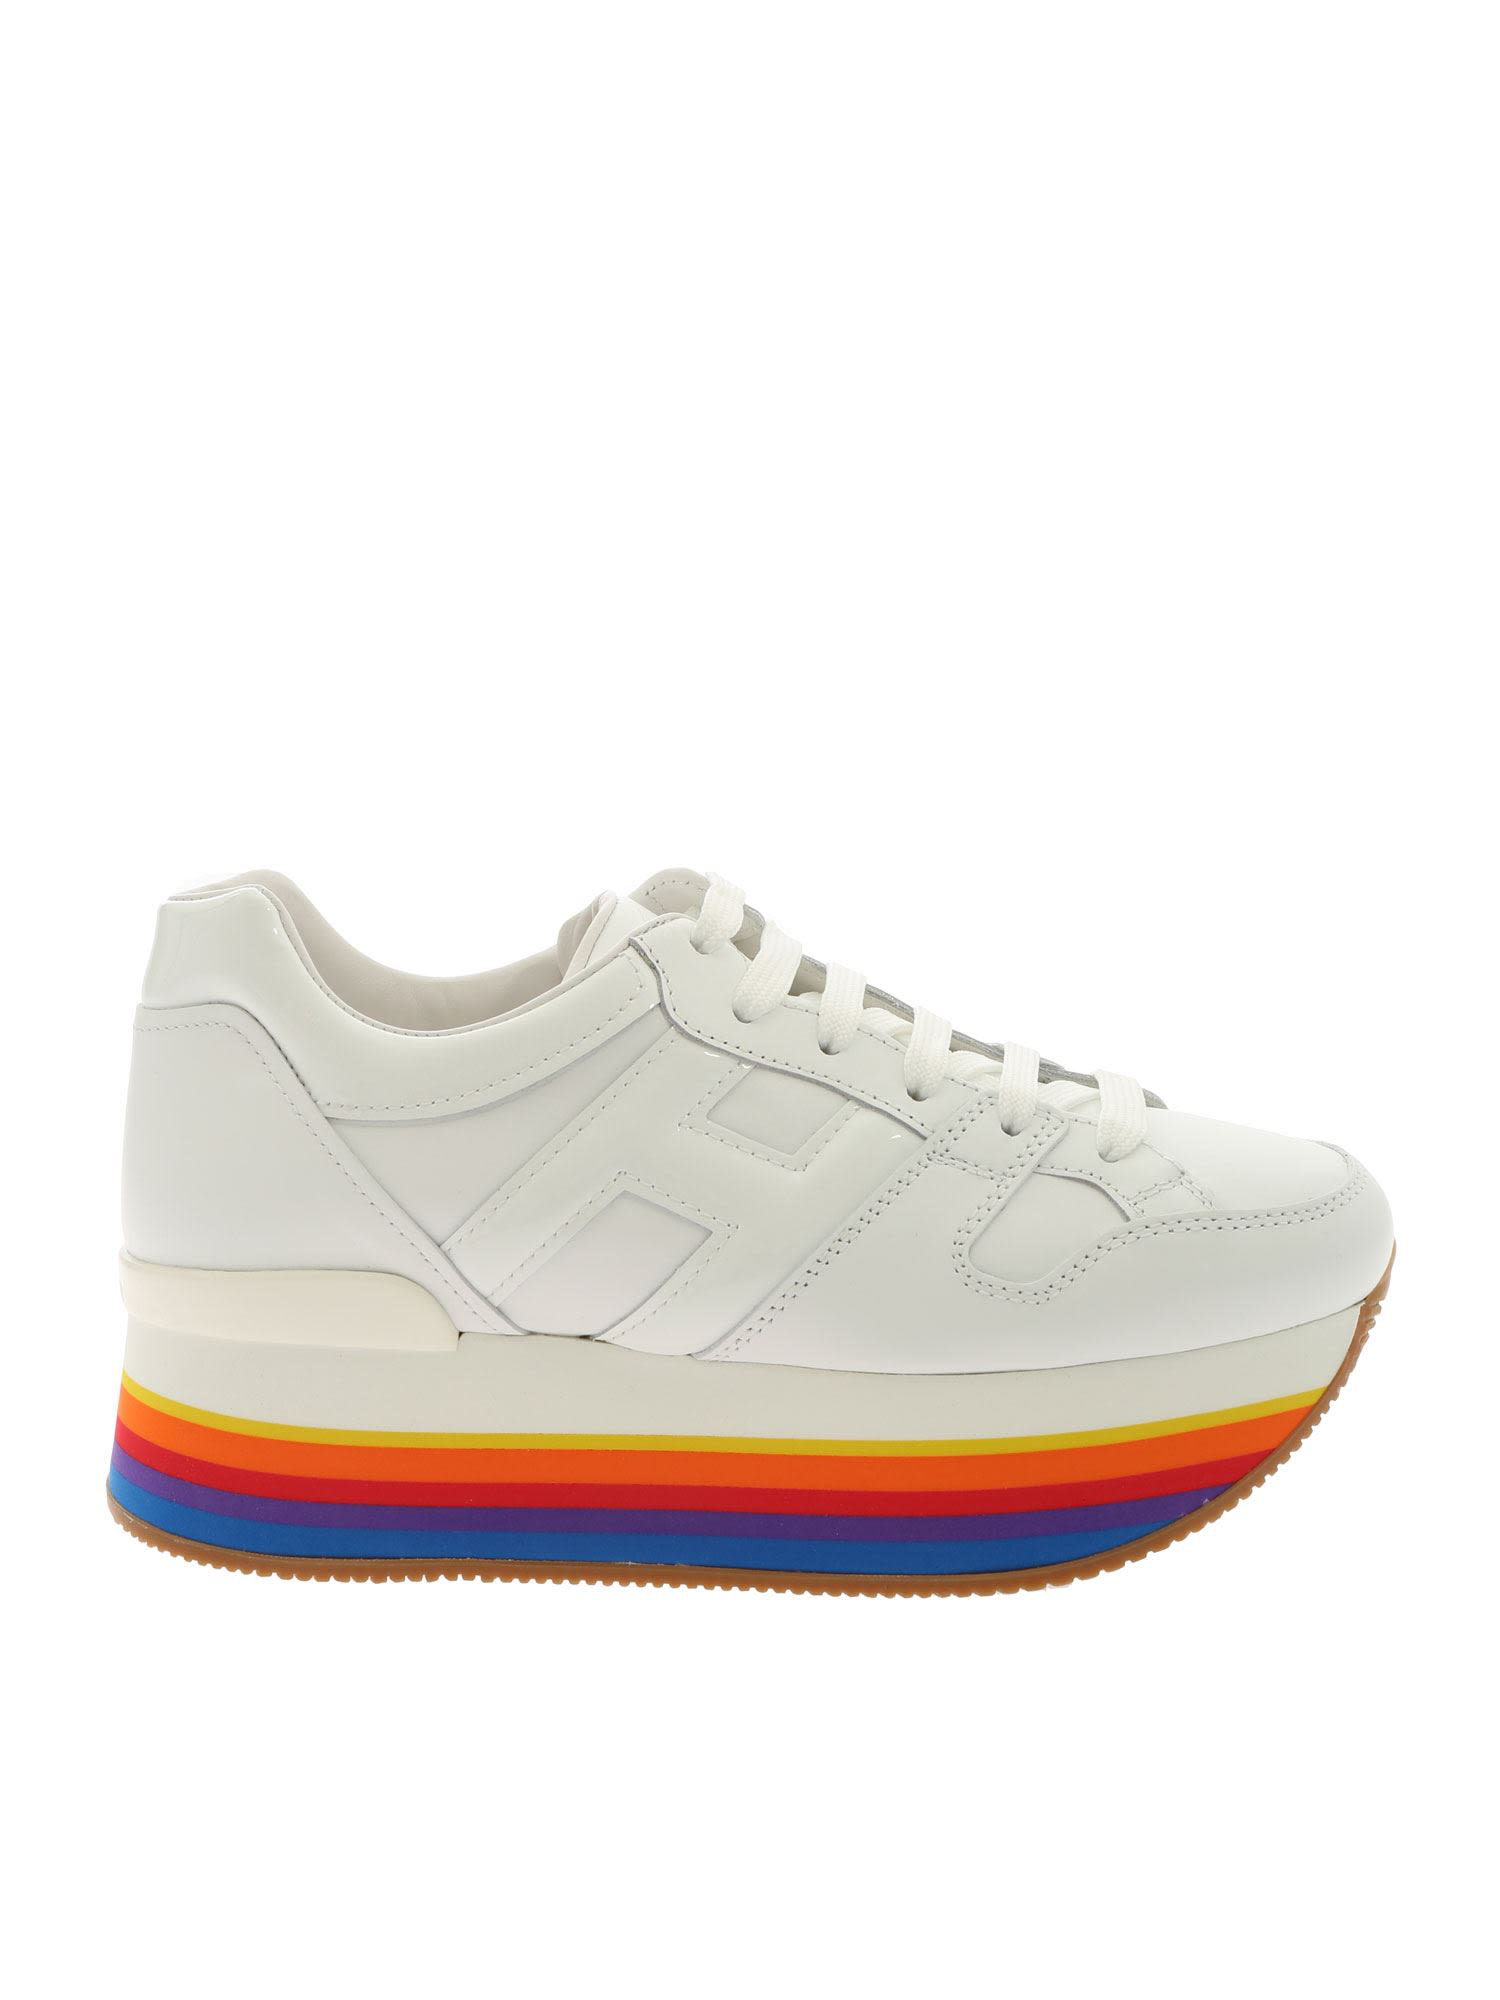 ed9392bcfbf60 Hogan Maxi H222 Platform Sneakers In White